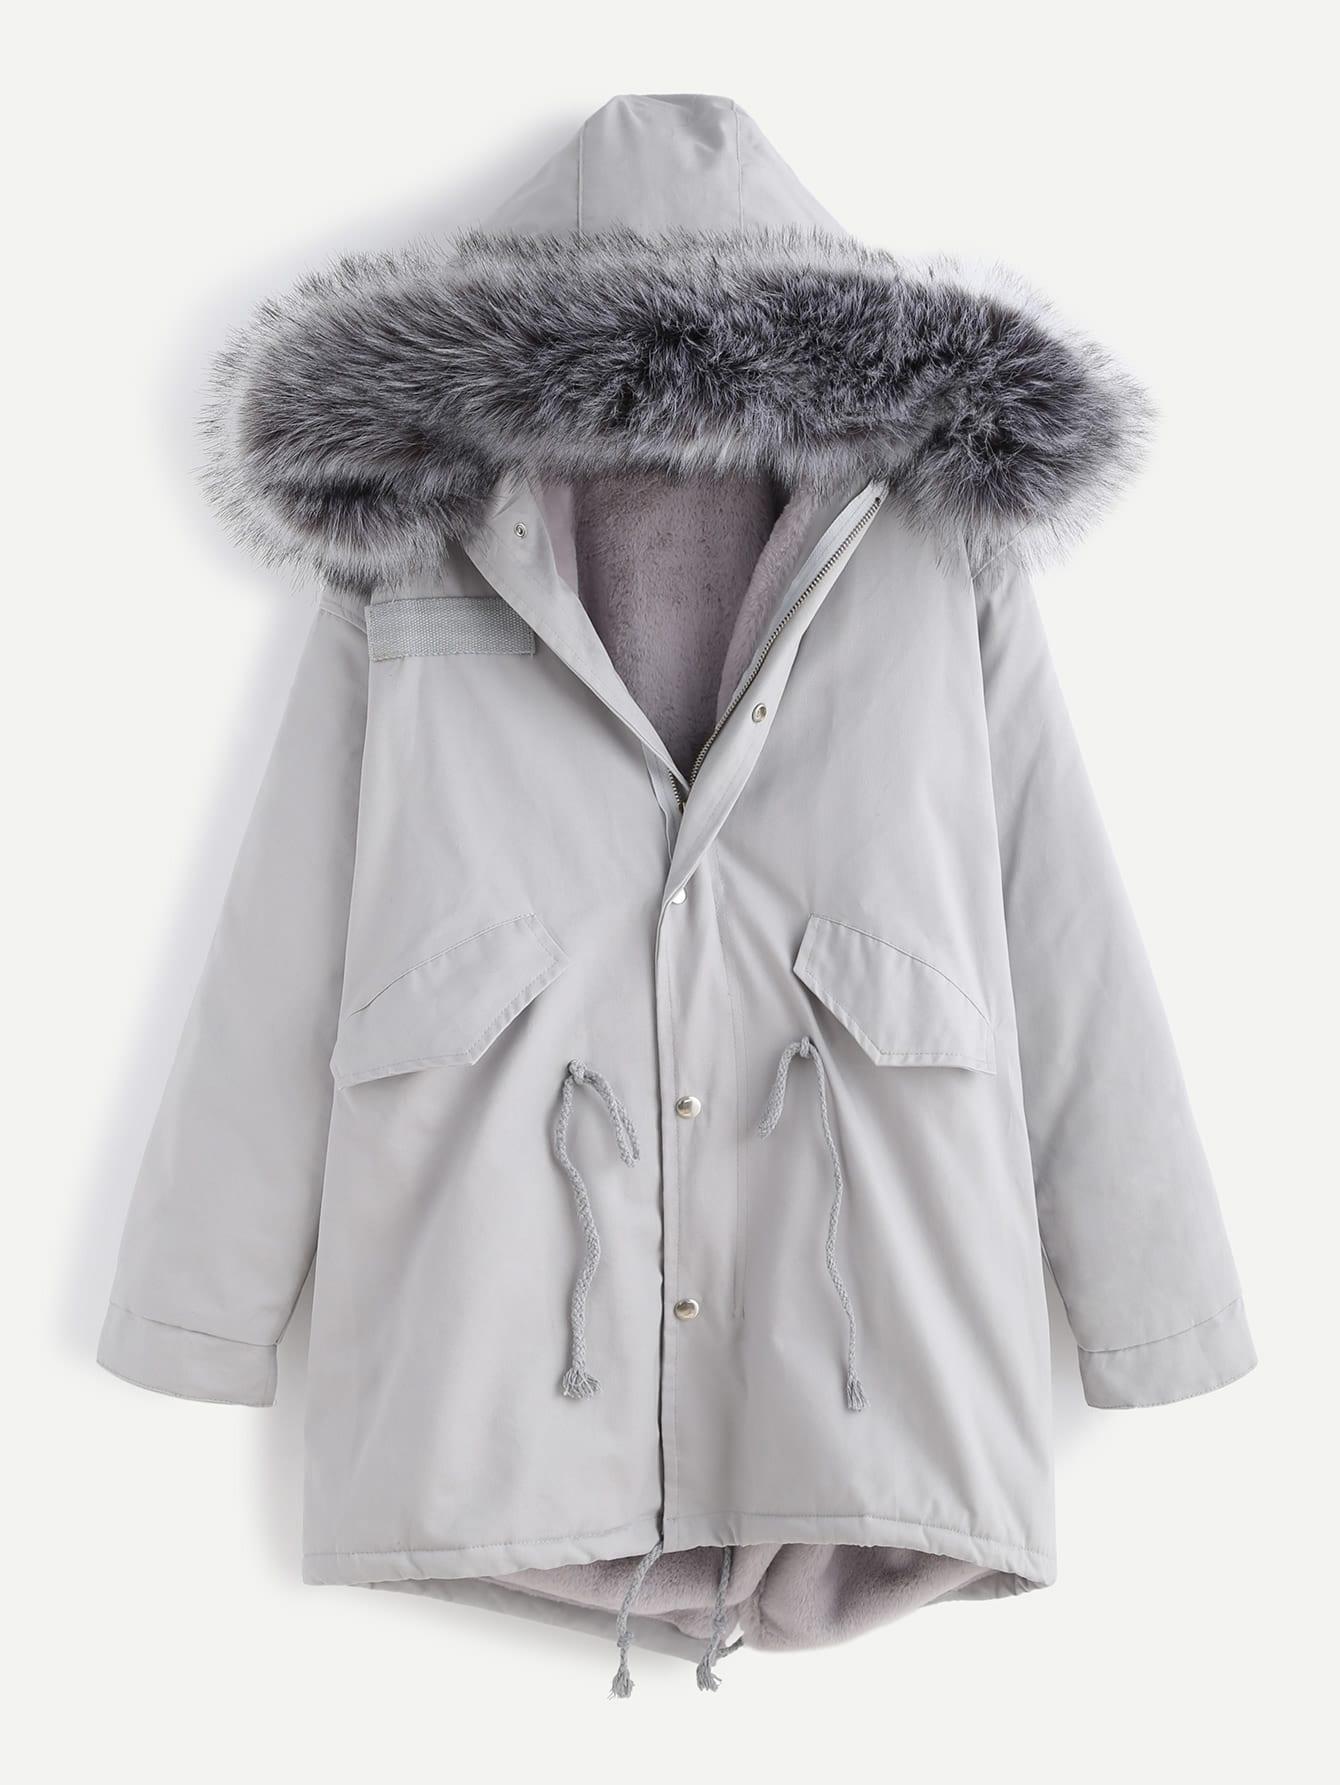 Grey Faux Fur Trim Drawstring Fleece Inside Hooded Coat